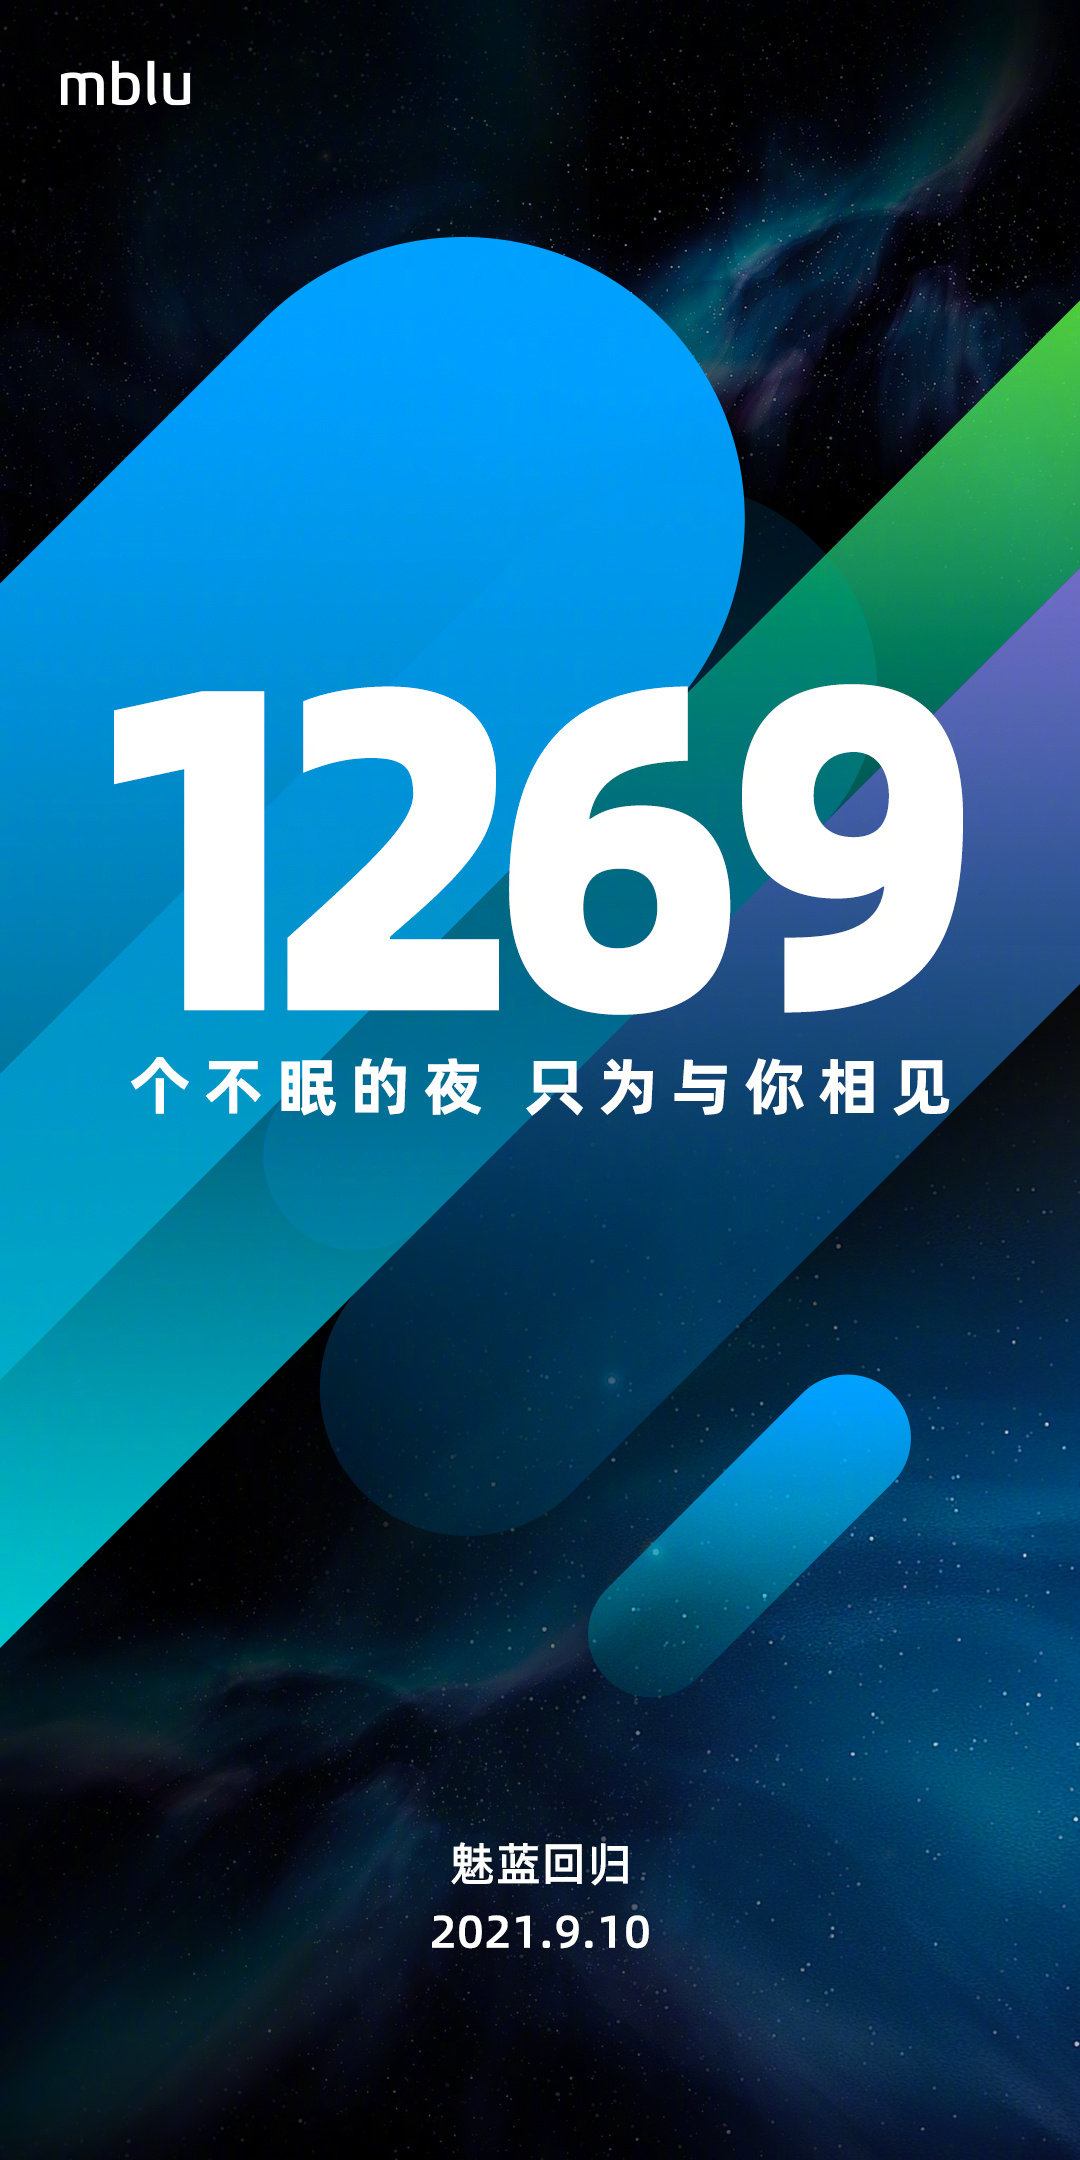 Meizu возрождает серию Meilan спустя 3,5 года Meizu  - oficialno_meizu_vozrozhdaet_meilan_mblu_spusta_35_goda_1